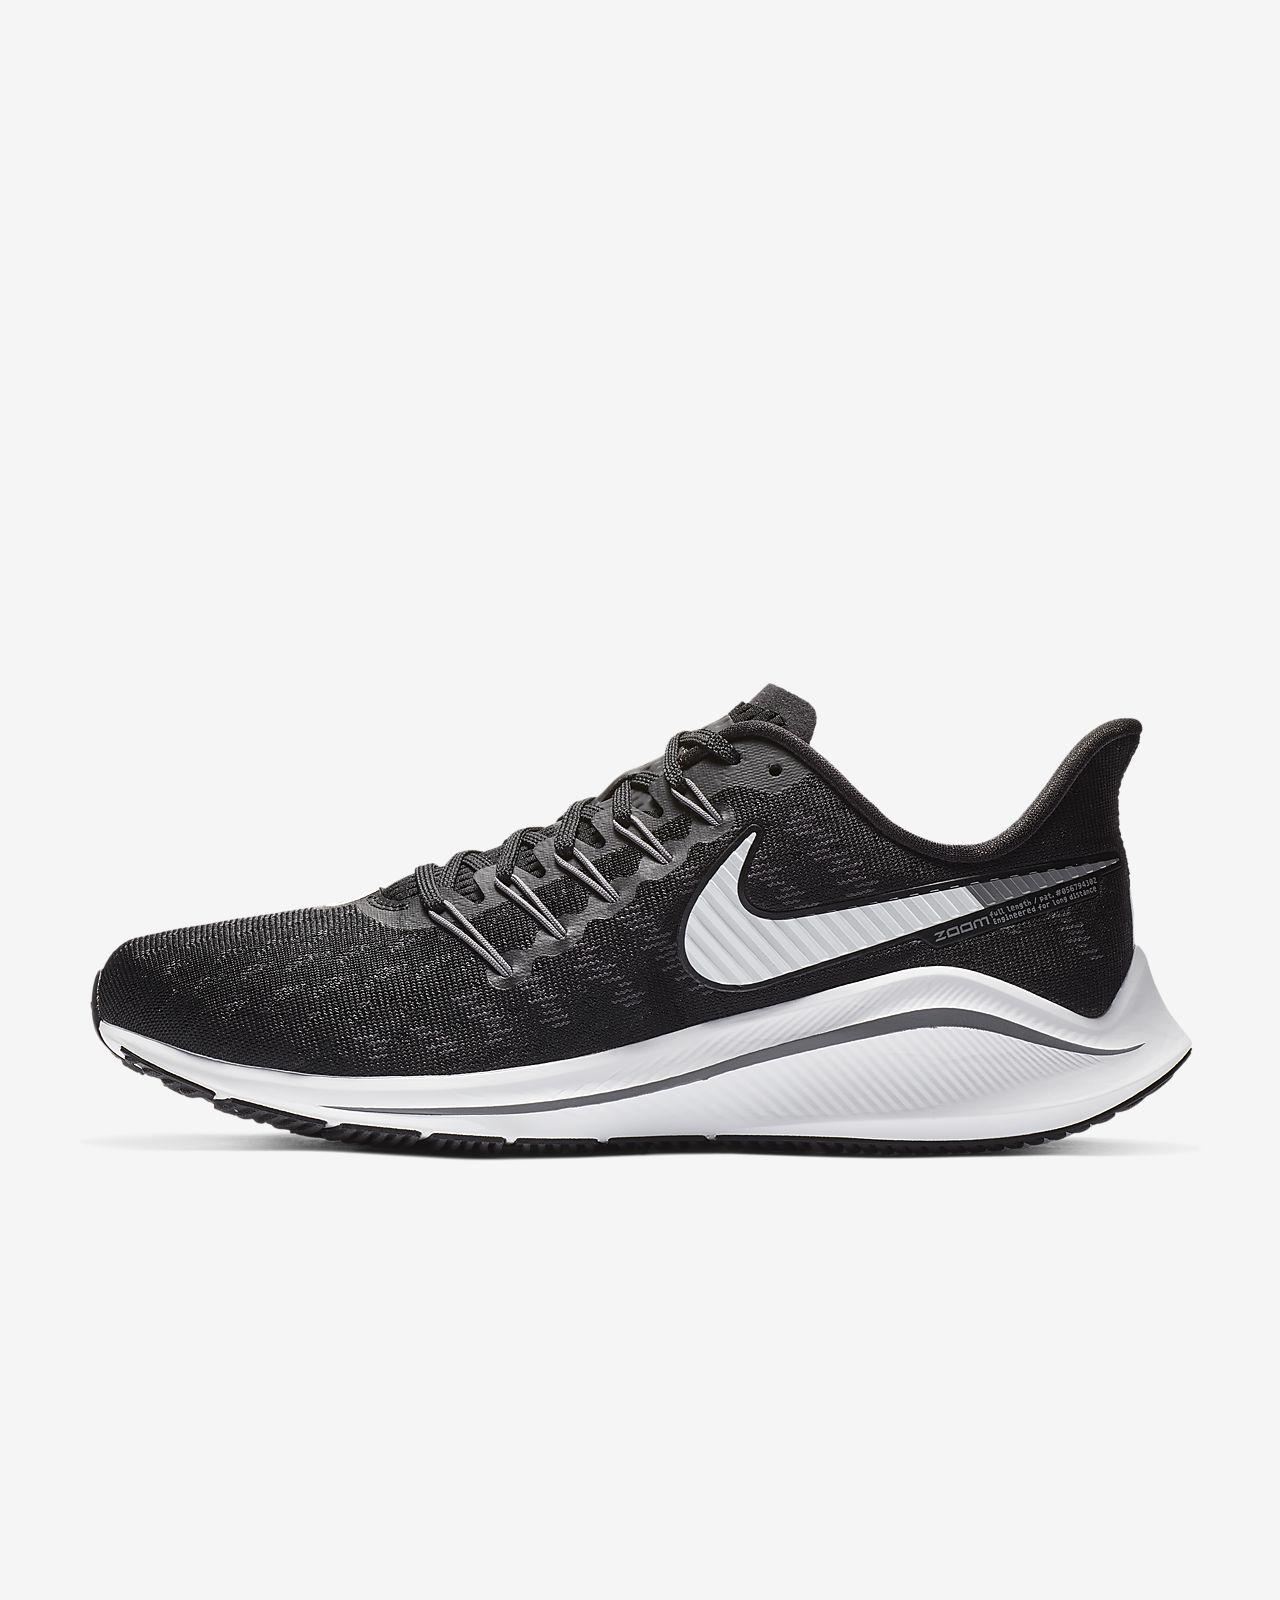 Nike Air Zoom Vomero 14 男款跑鞋